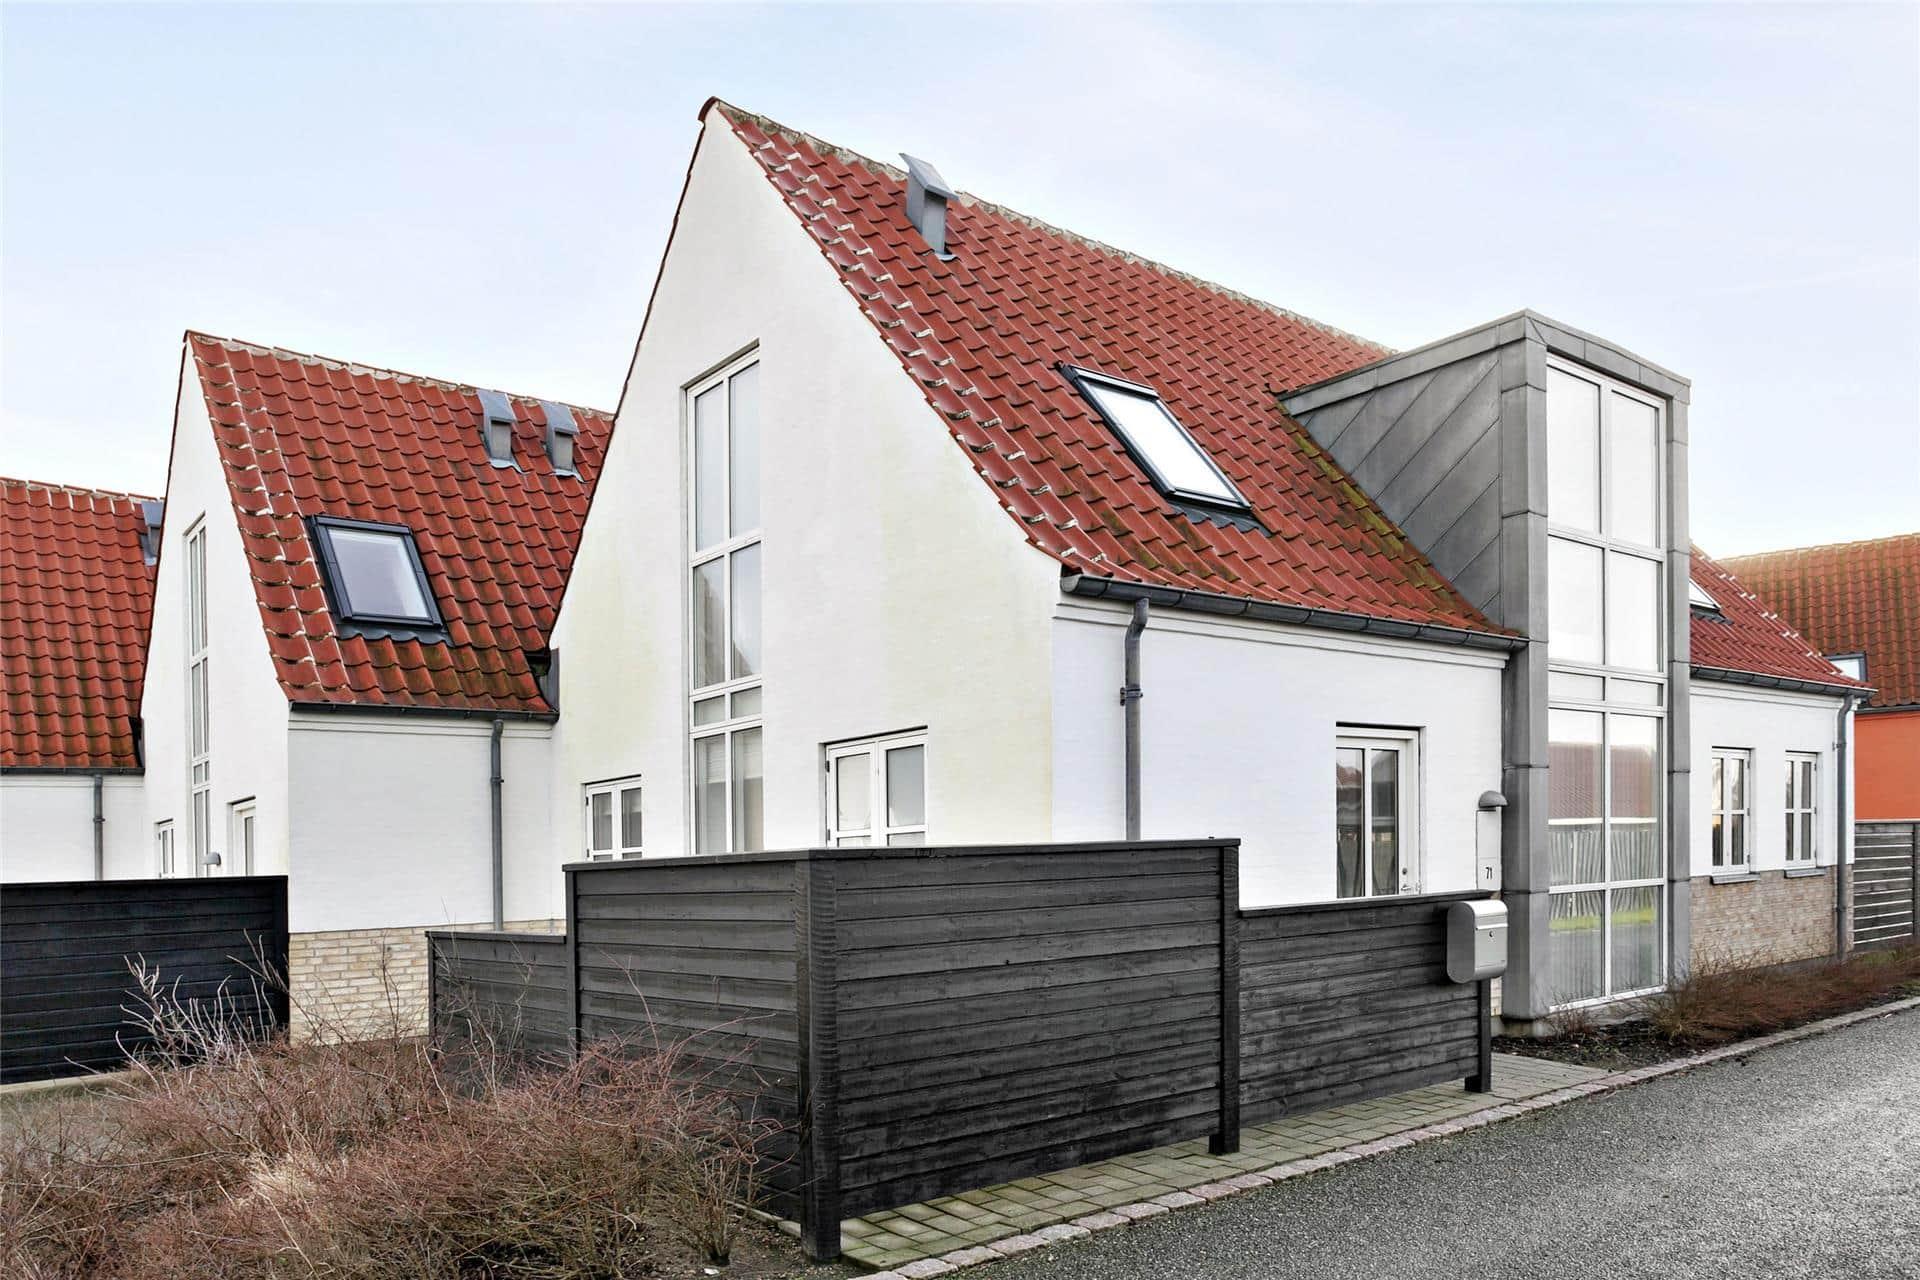 Bild 1-14 Ferienhaus 1114, Josefines Have 71, DK - 9480 Løkken